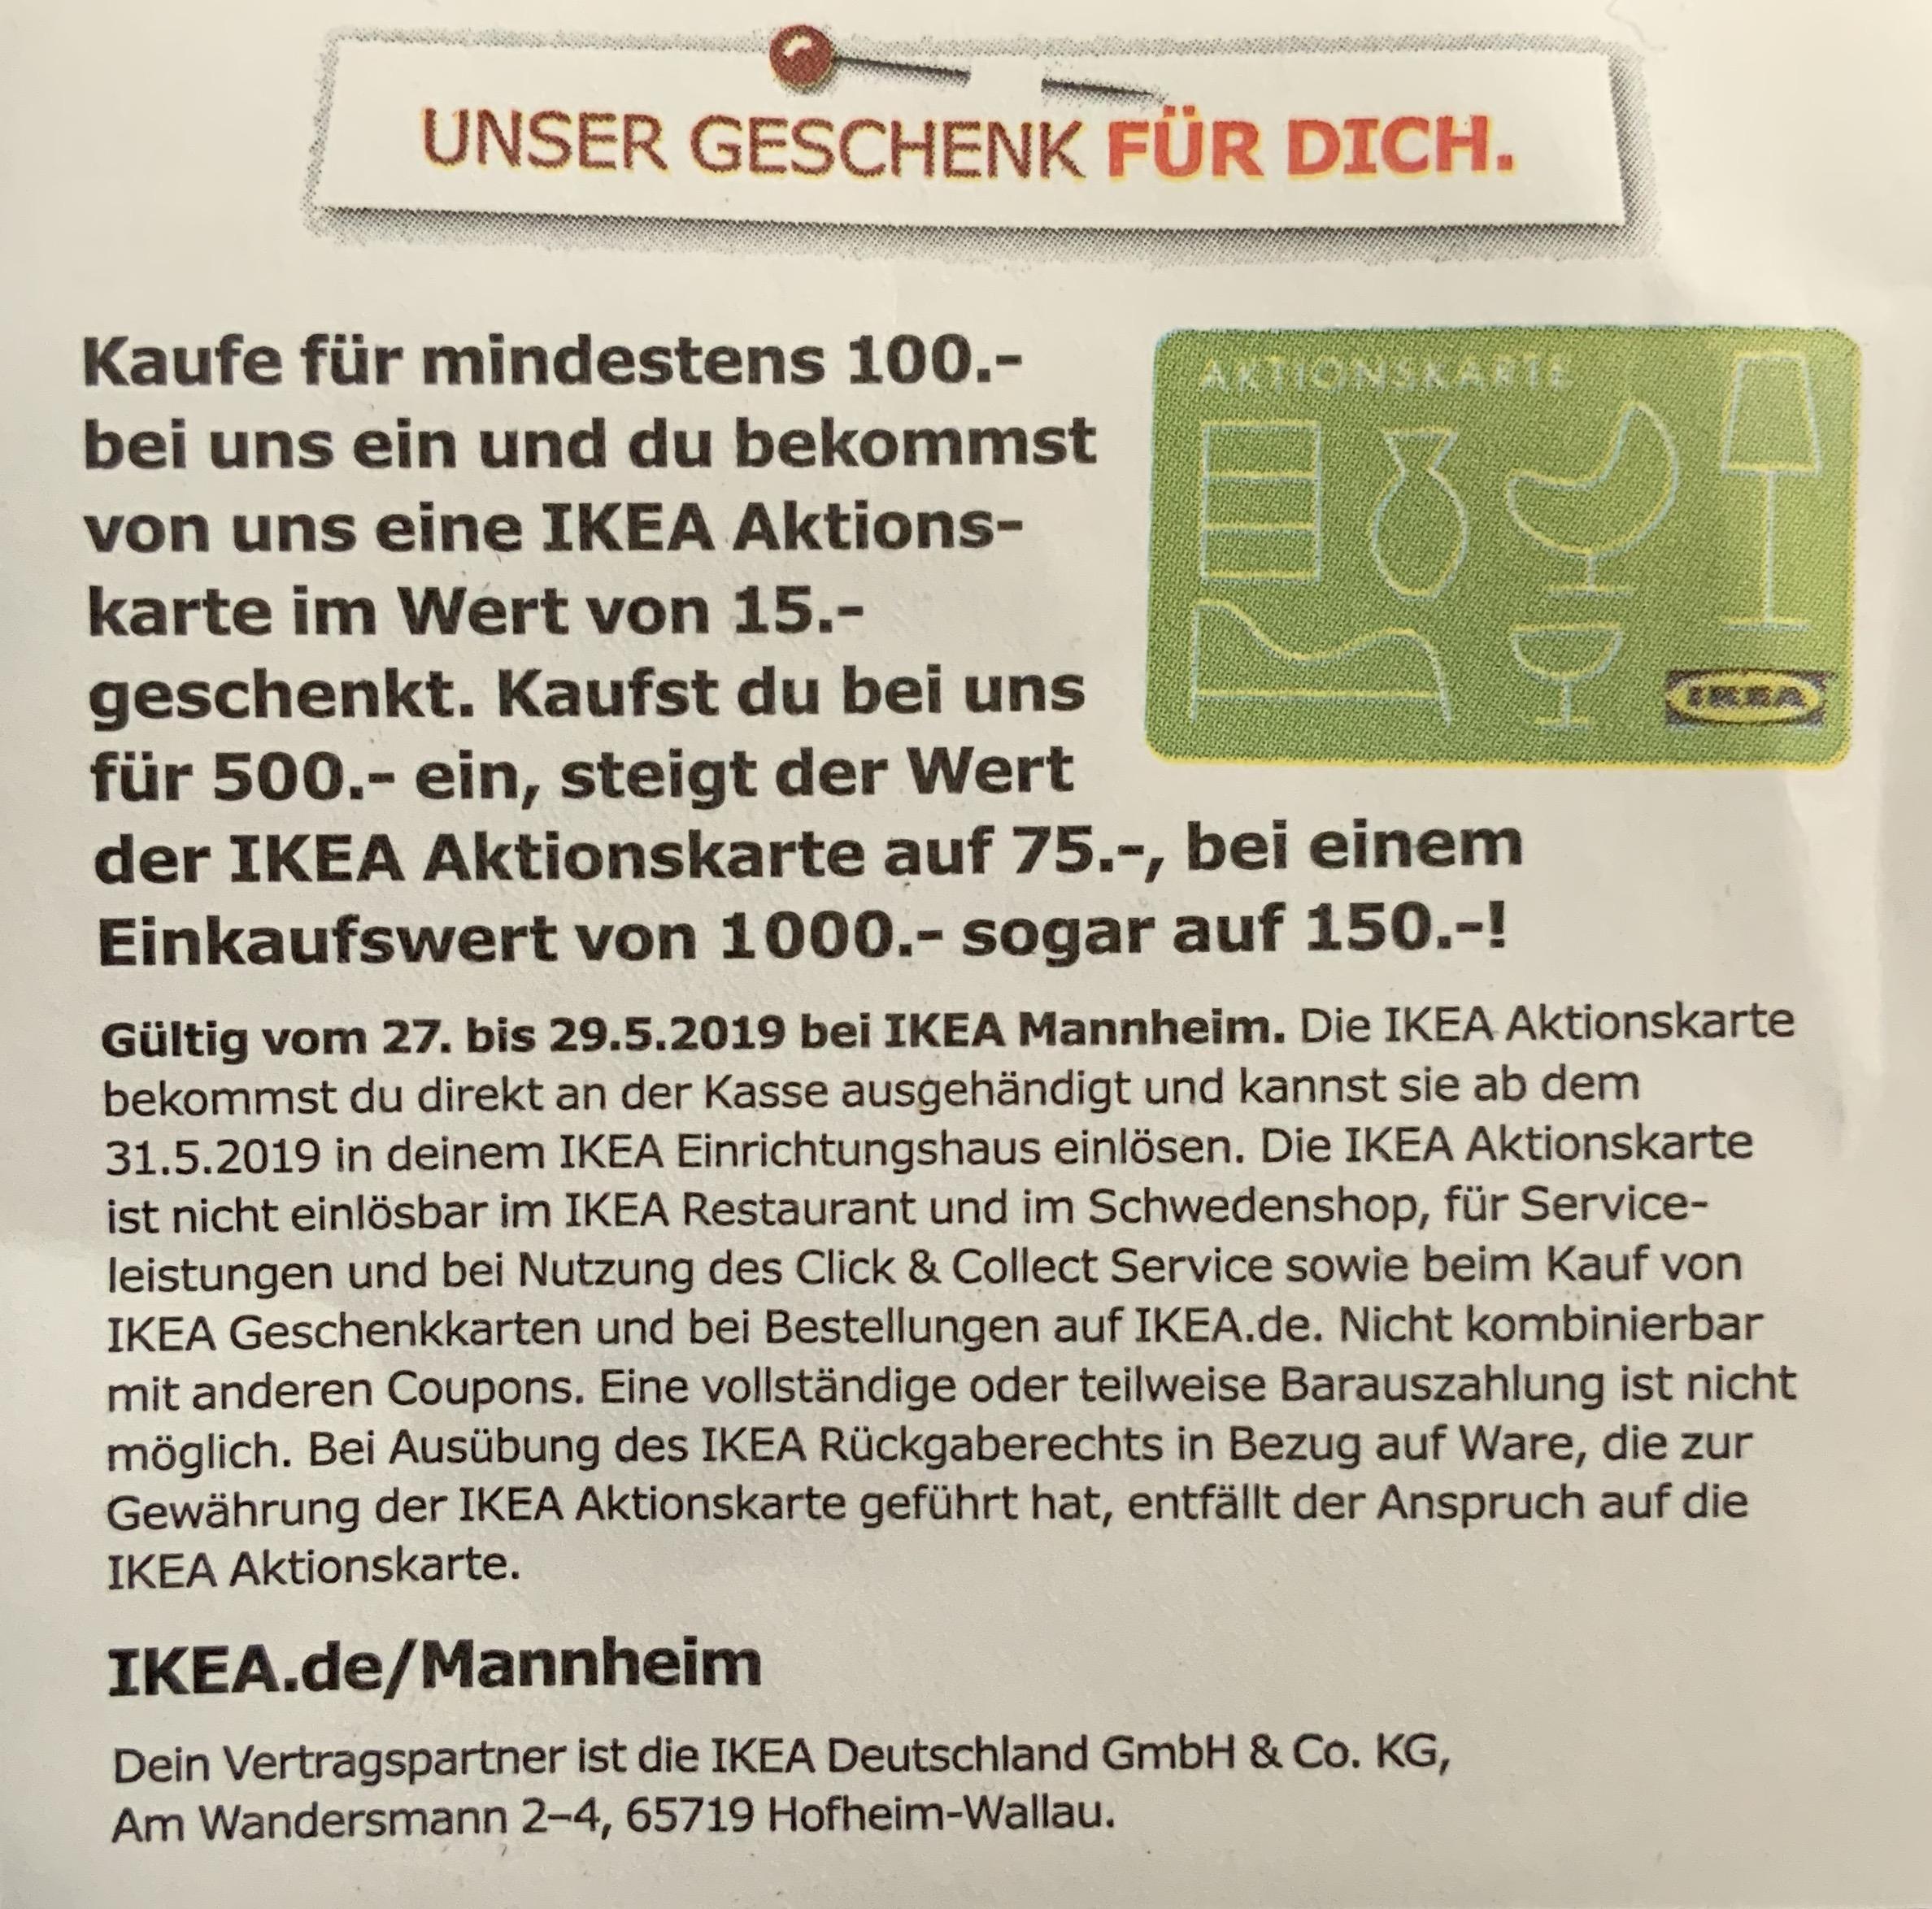 [Lokal IKEA Mannheim] 27.05. - 29.05. Aktionskarte über 15 Euro ab Einkauf über 100 Euro, 75 Euro ab 500 Euro, 150 Euro ab 1000 Euro